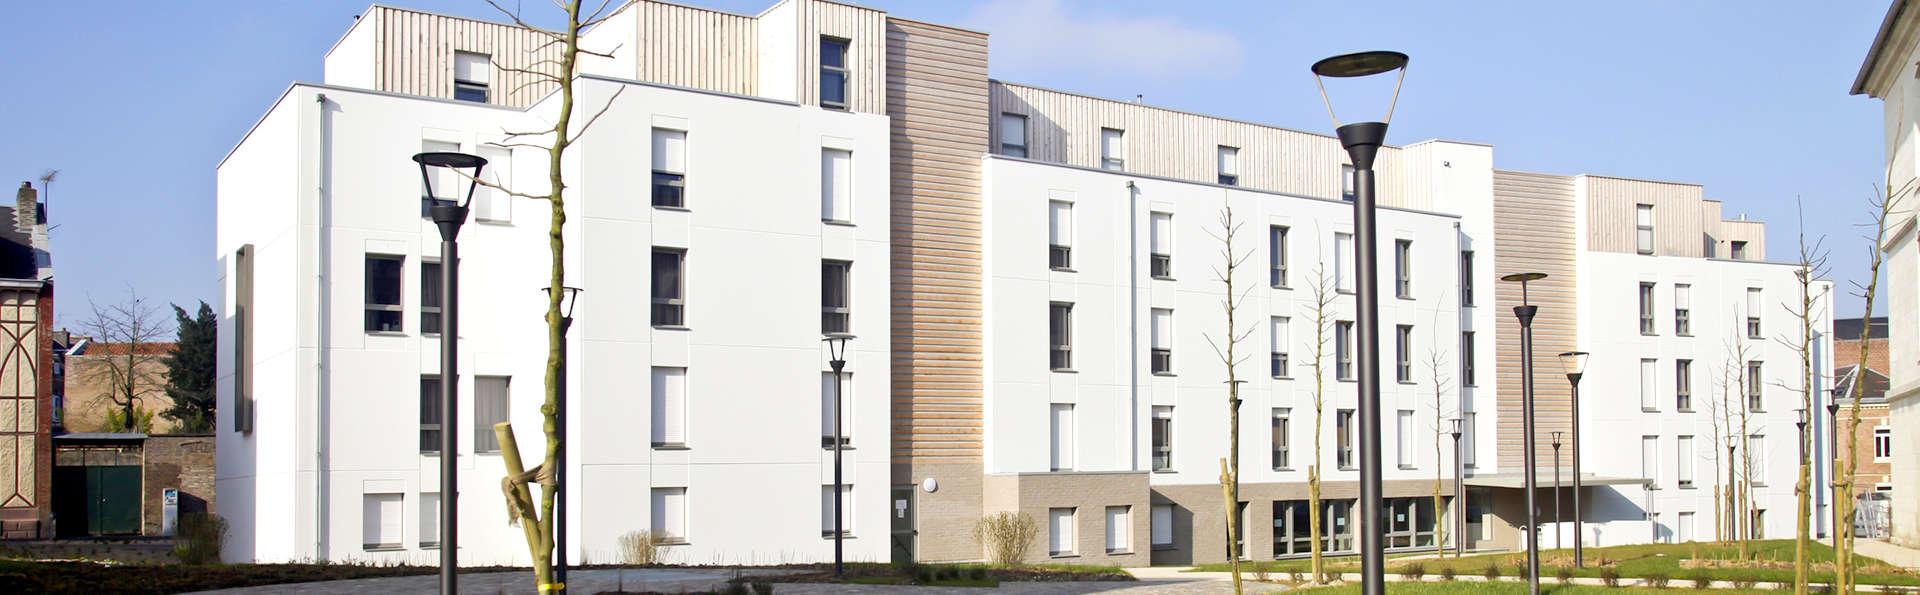 Appart'hôtel Odalys Blamont - Edit_Front4.jpg